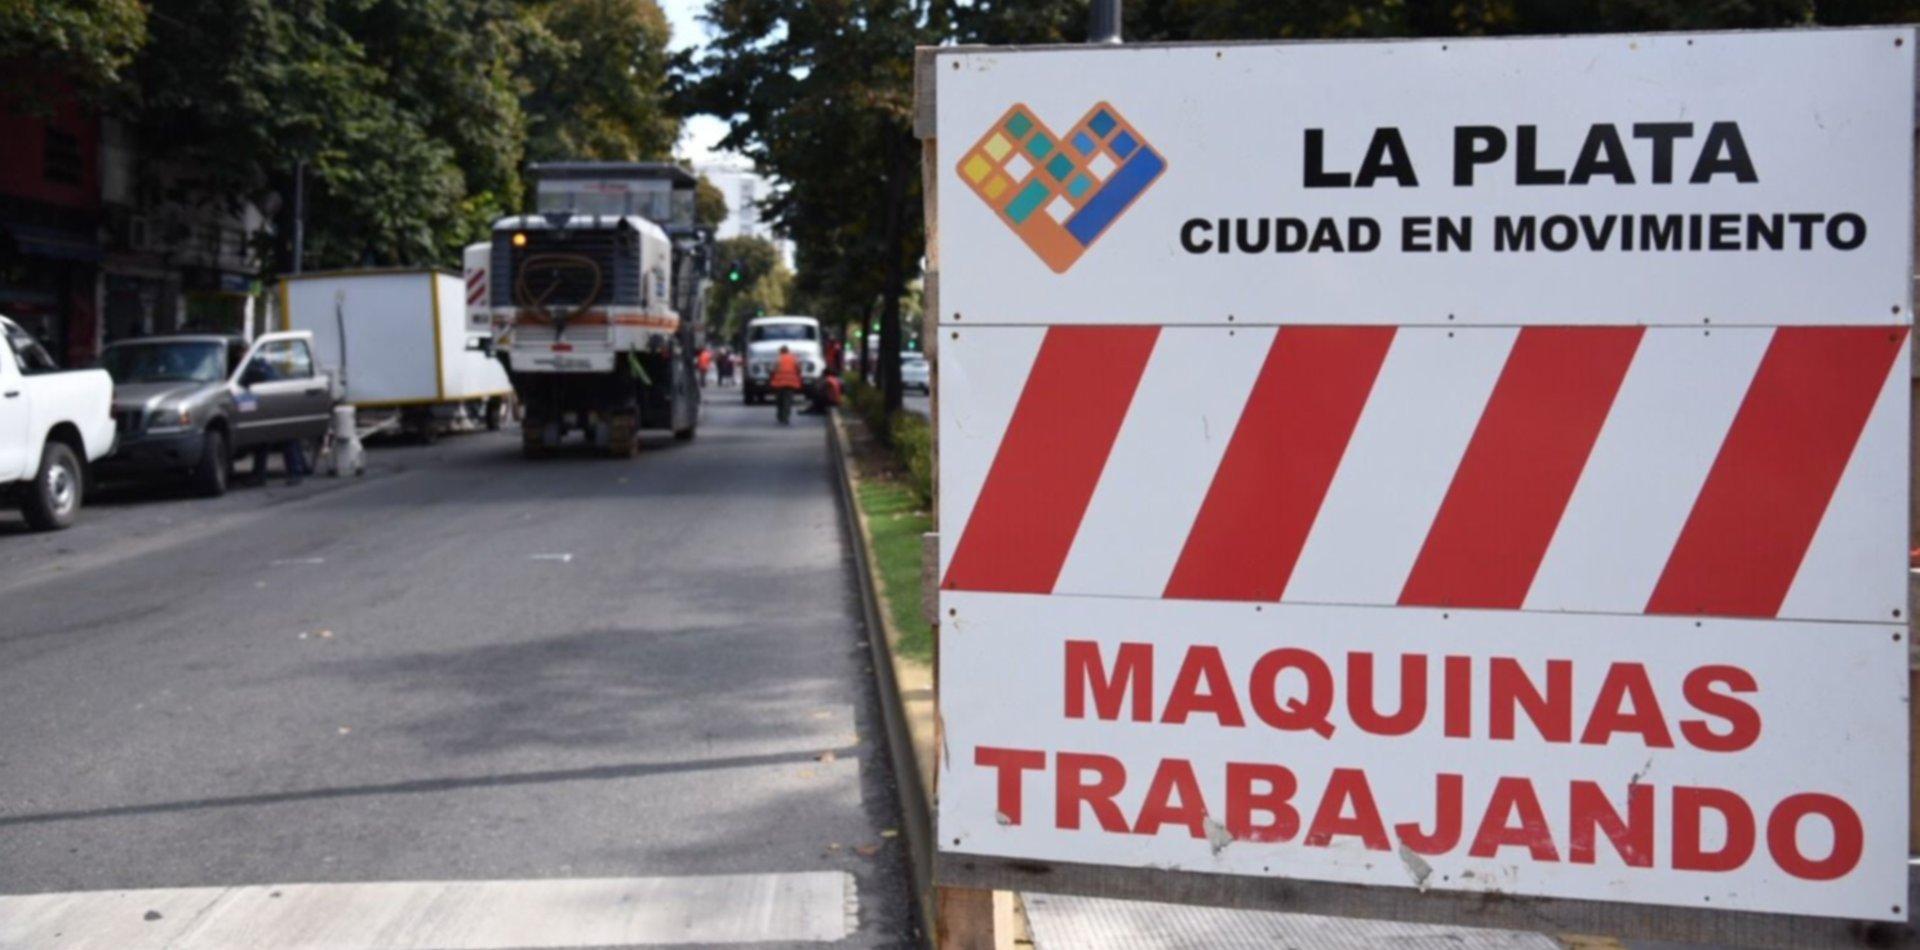 Anuncian cortes de tránsito en plena diagonal 74 por obras de repavimentación